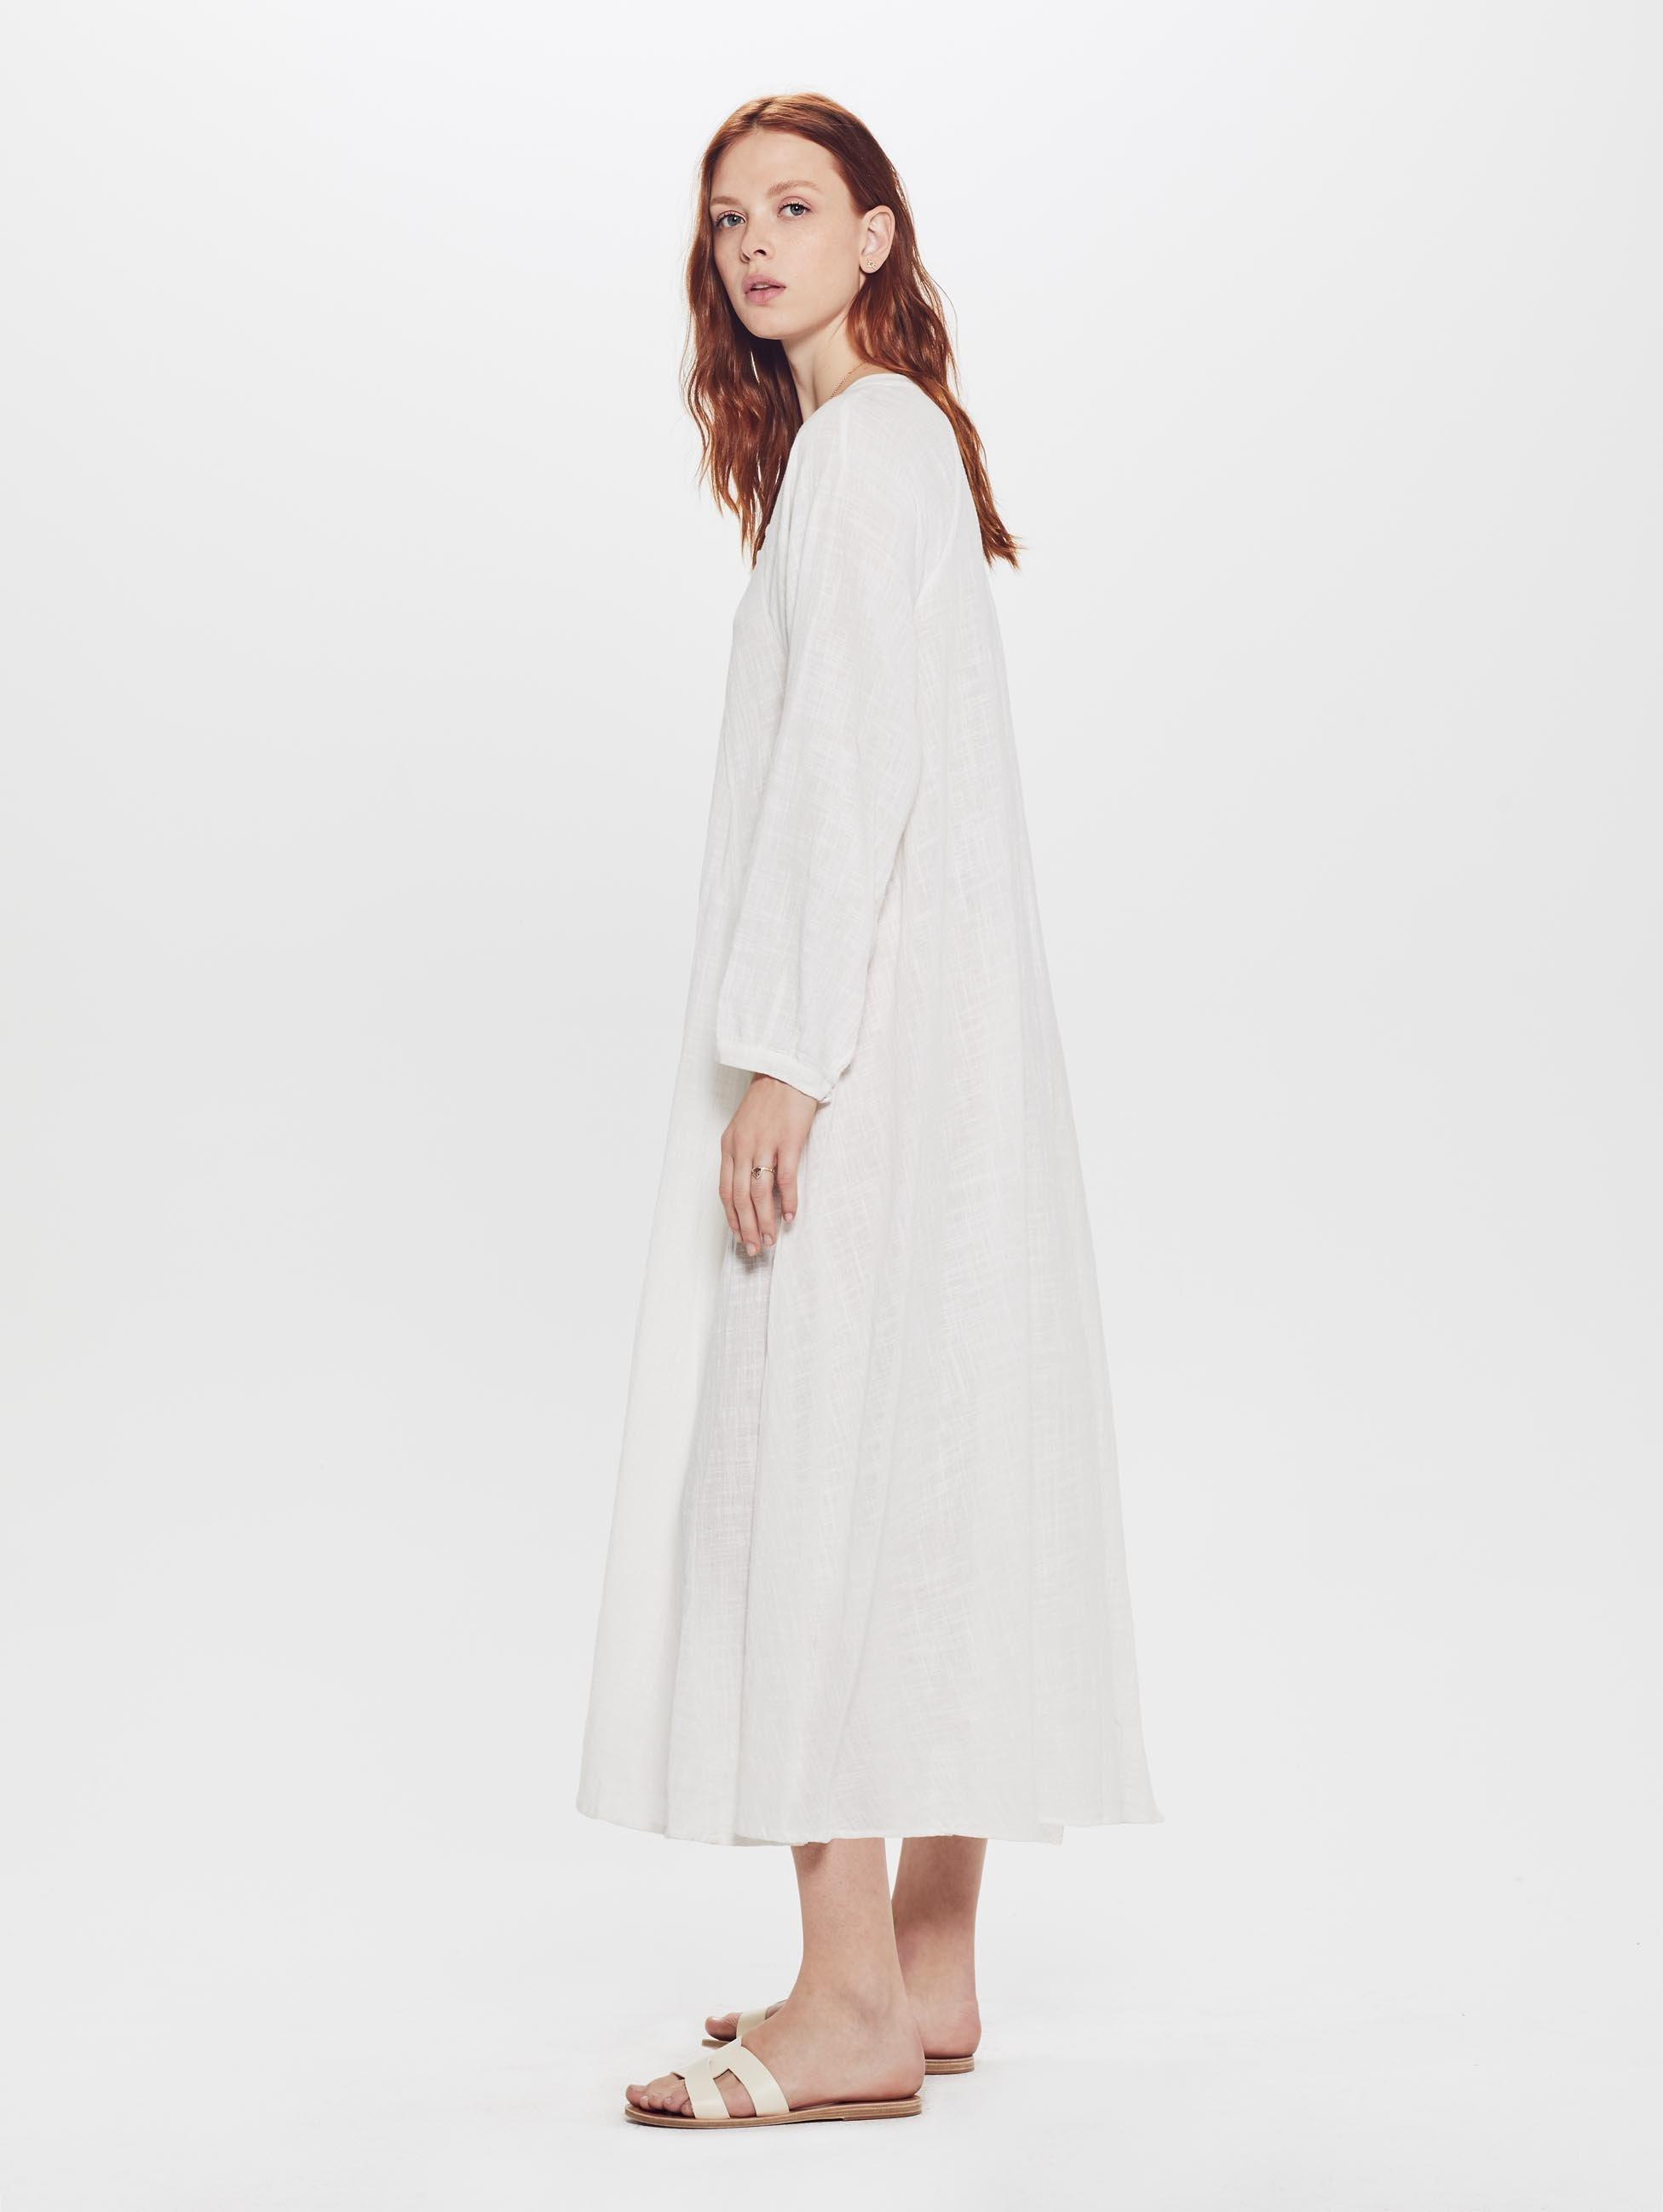 141b98a69aa Natalie Martin Fiore Maxi Cotton Gauze Dress White in White - Lyst